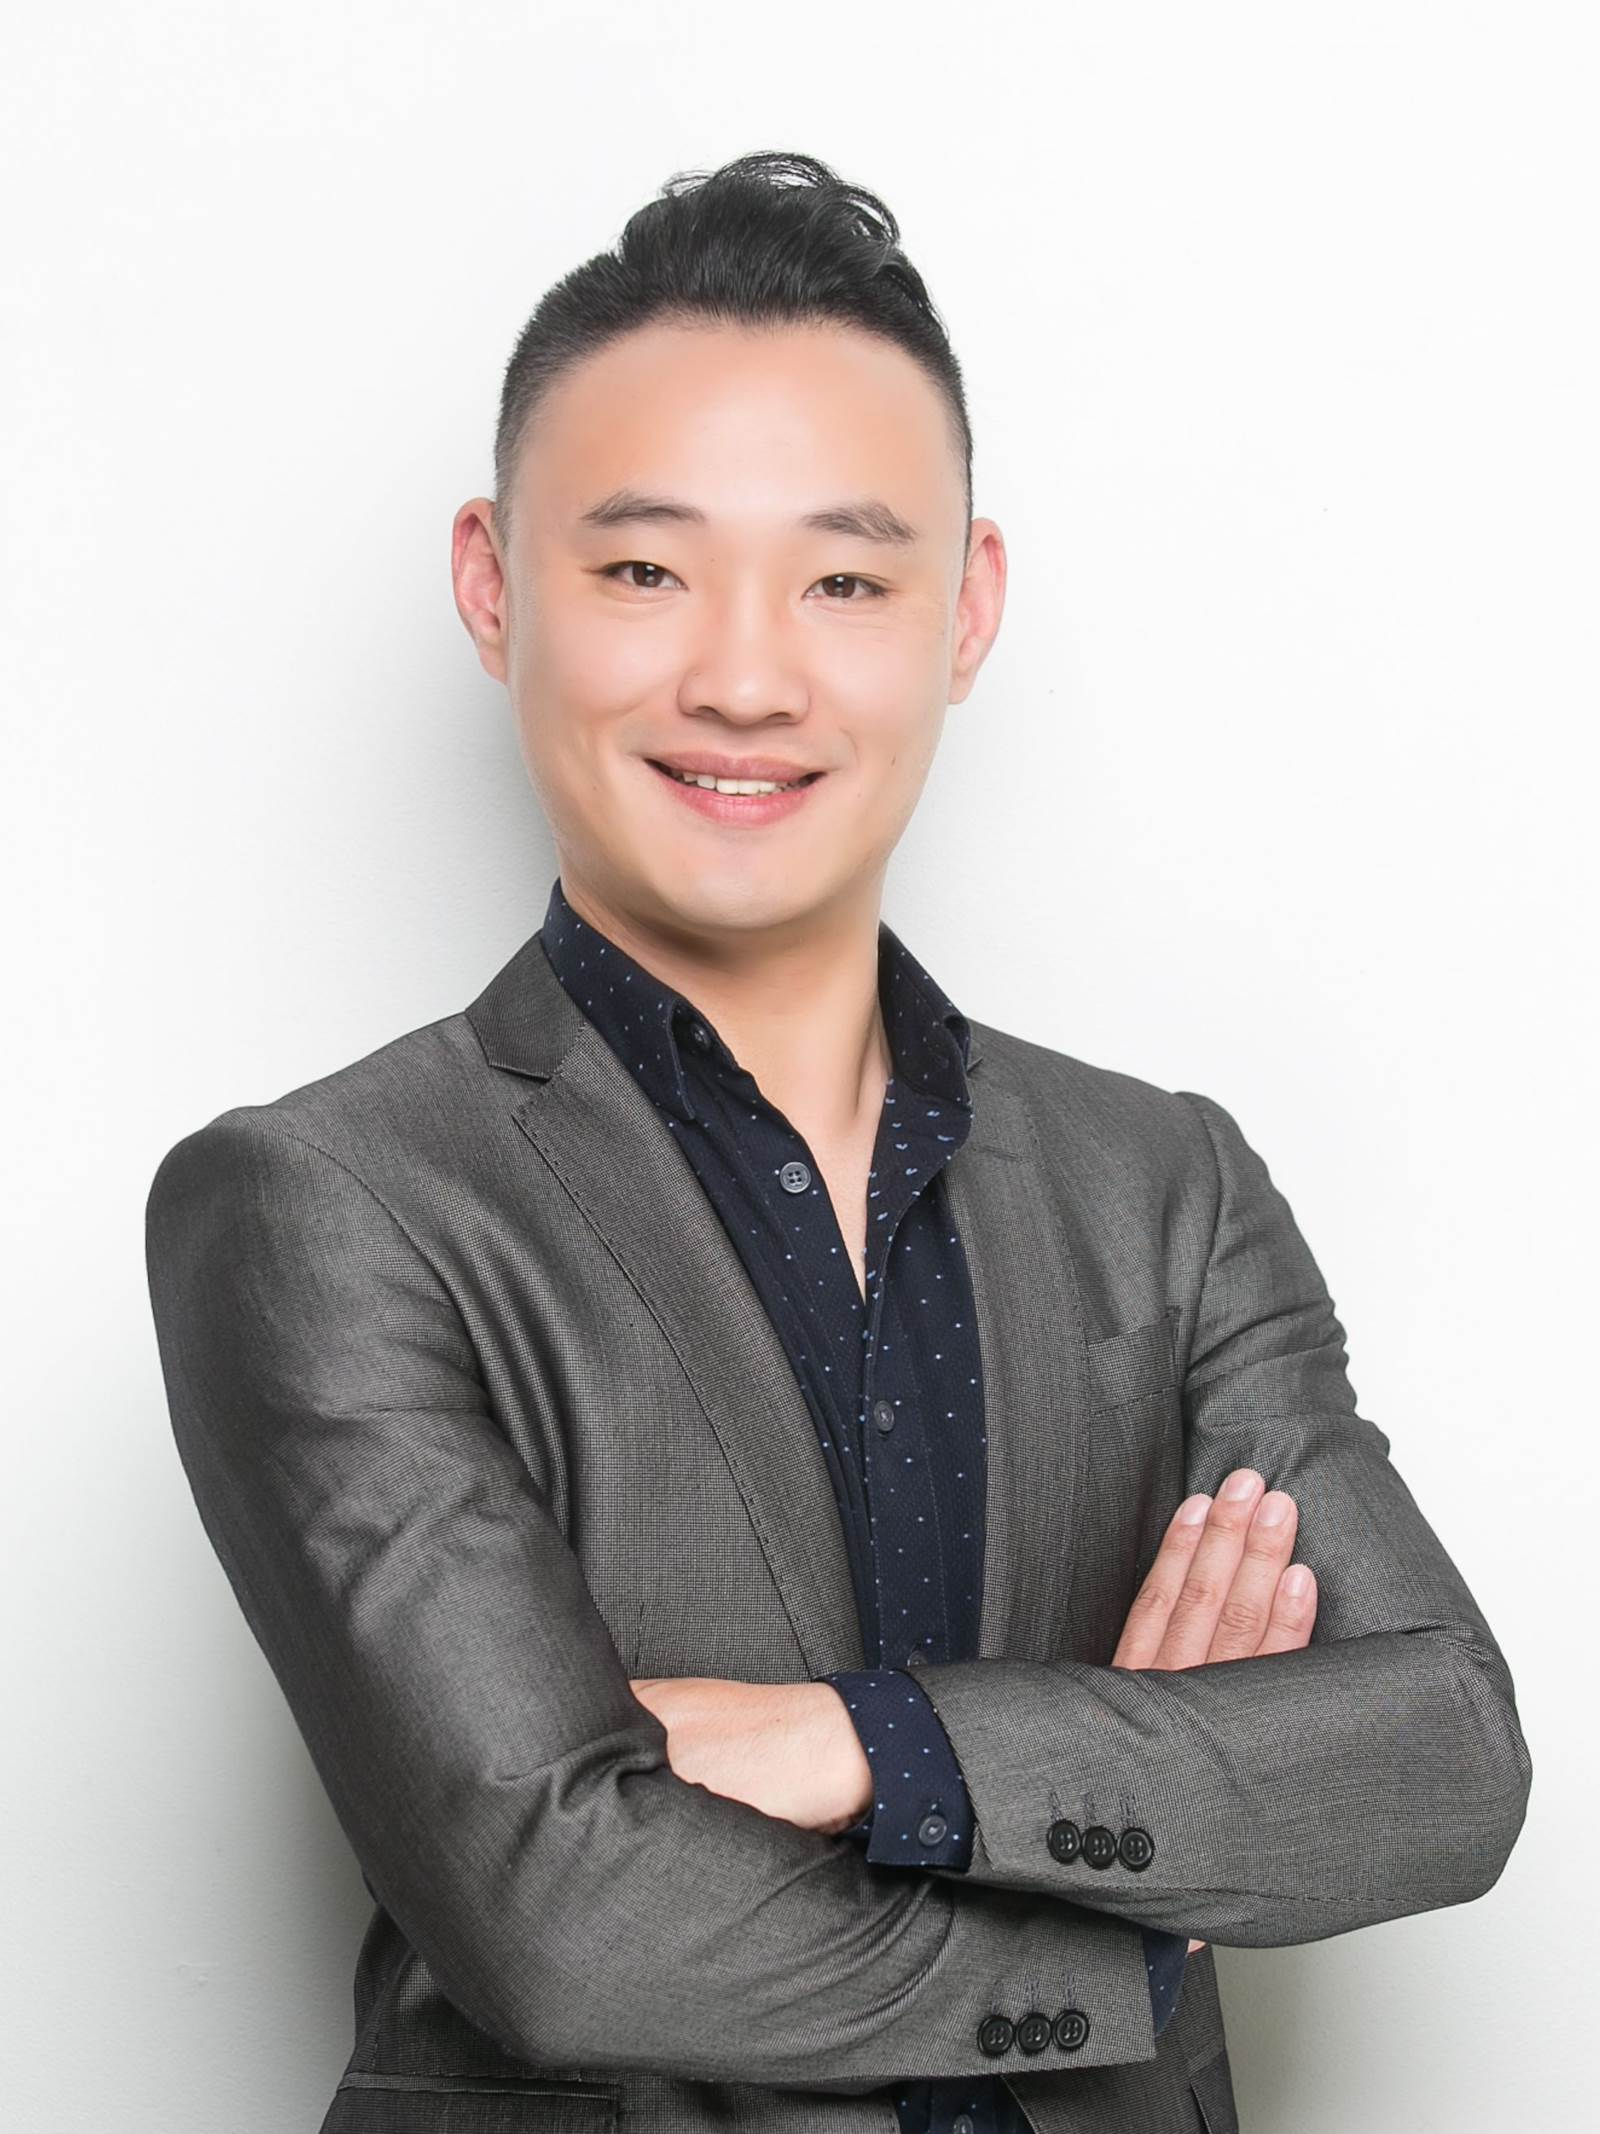 Justin Ling